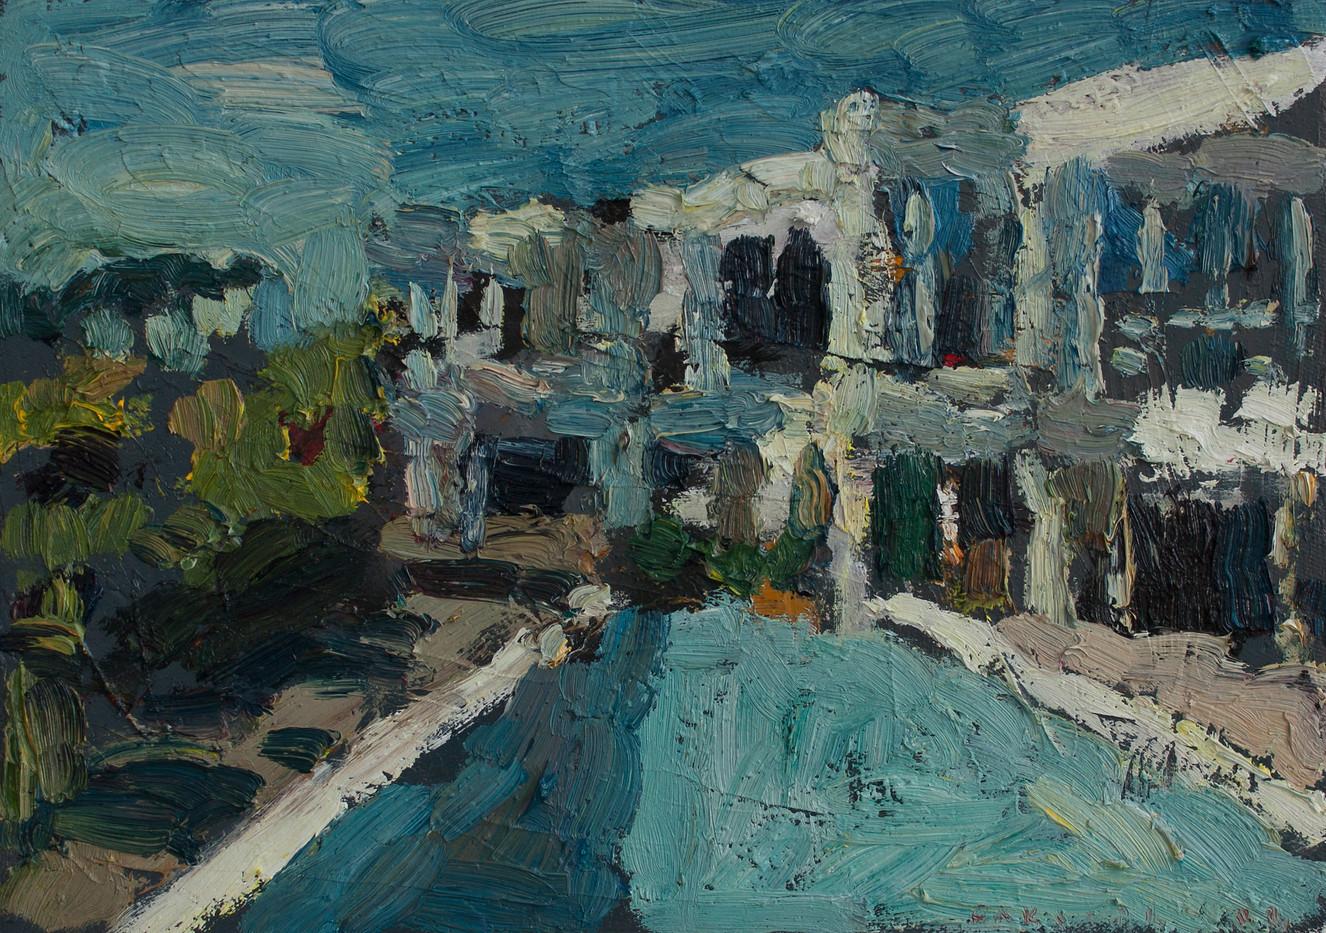 Anton Karstel | Property (Bishopscourt) | 2014 | Oil on Canvas | 22 x 31 cm